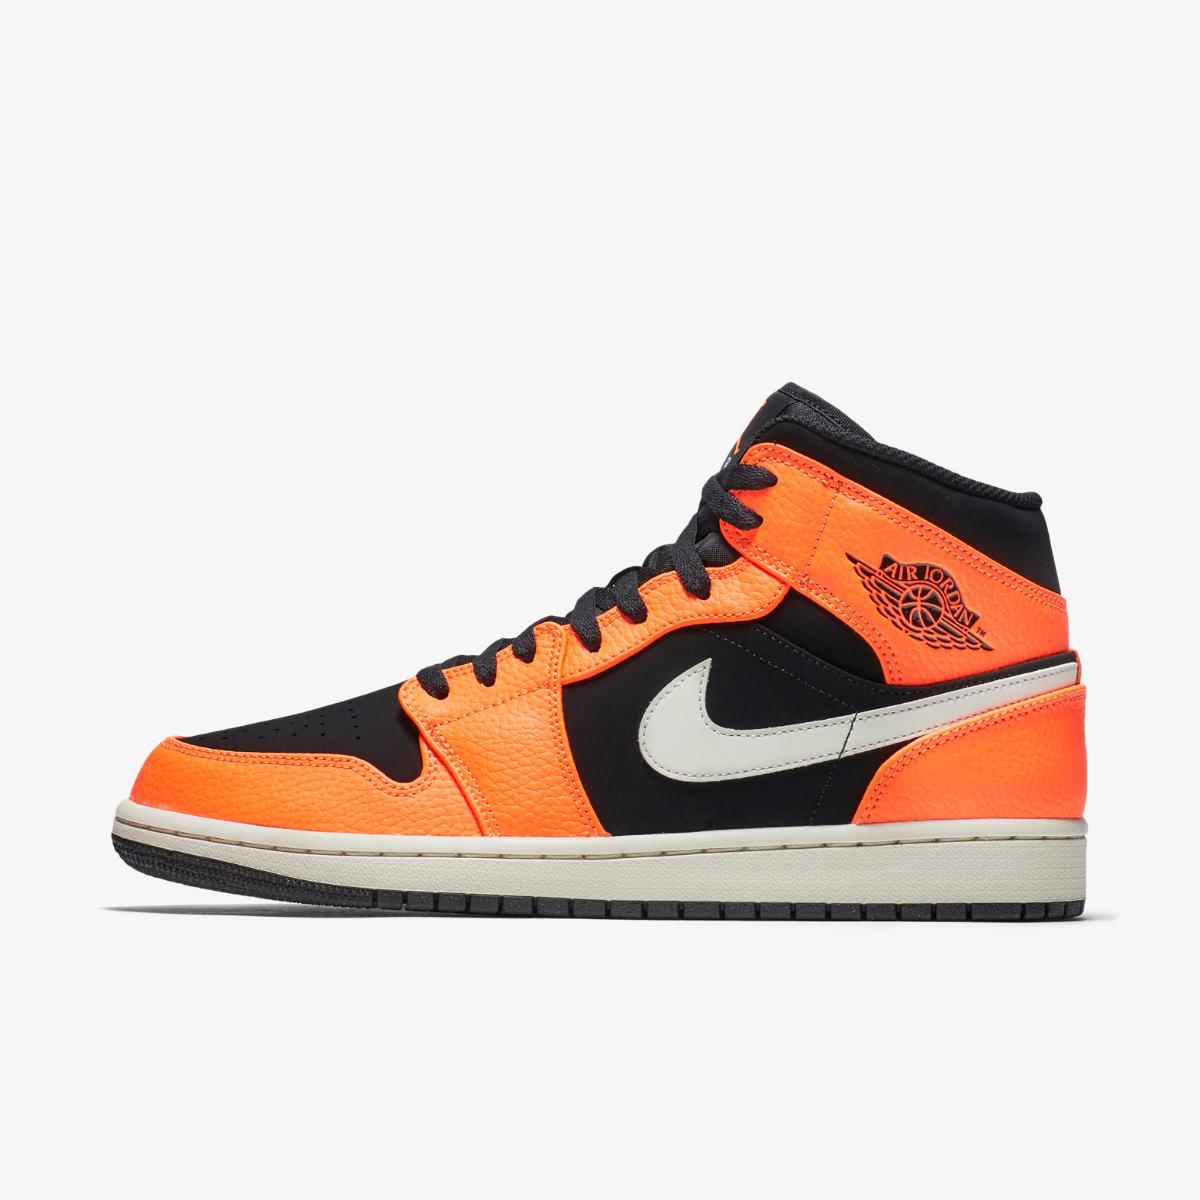 Кроссовки для баскетбола AIR JORDAN 1 MID 554724-062 купить ... 035bd1ff659